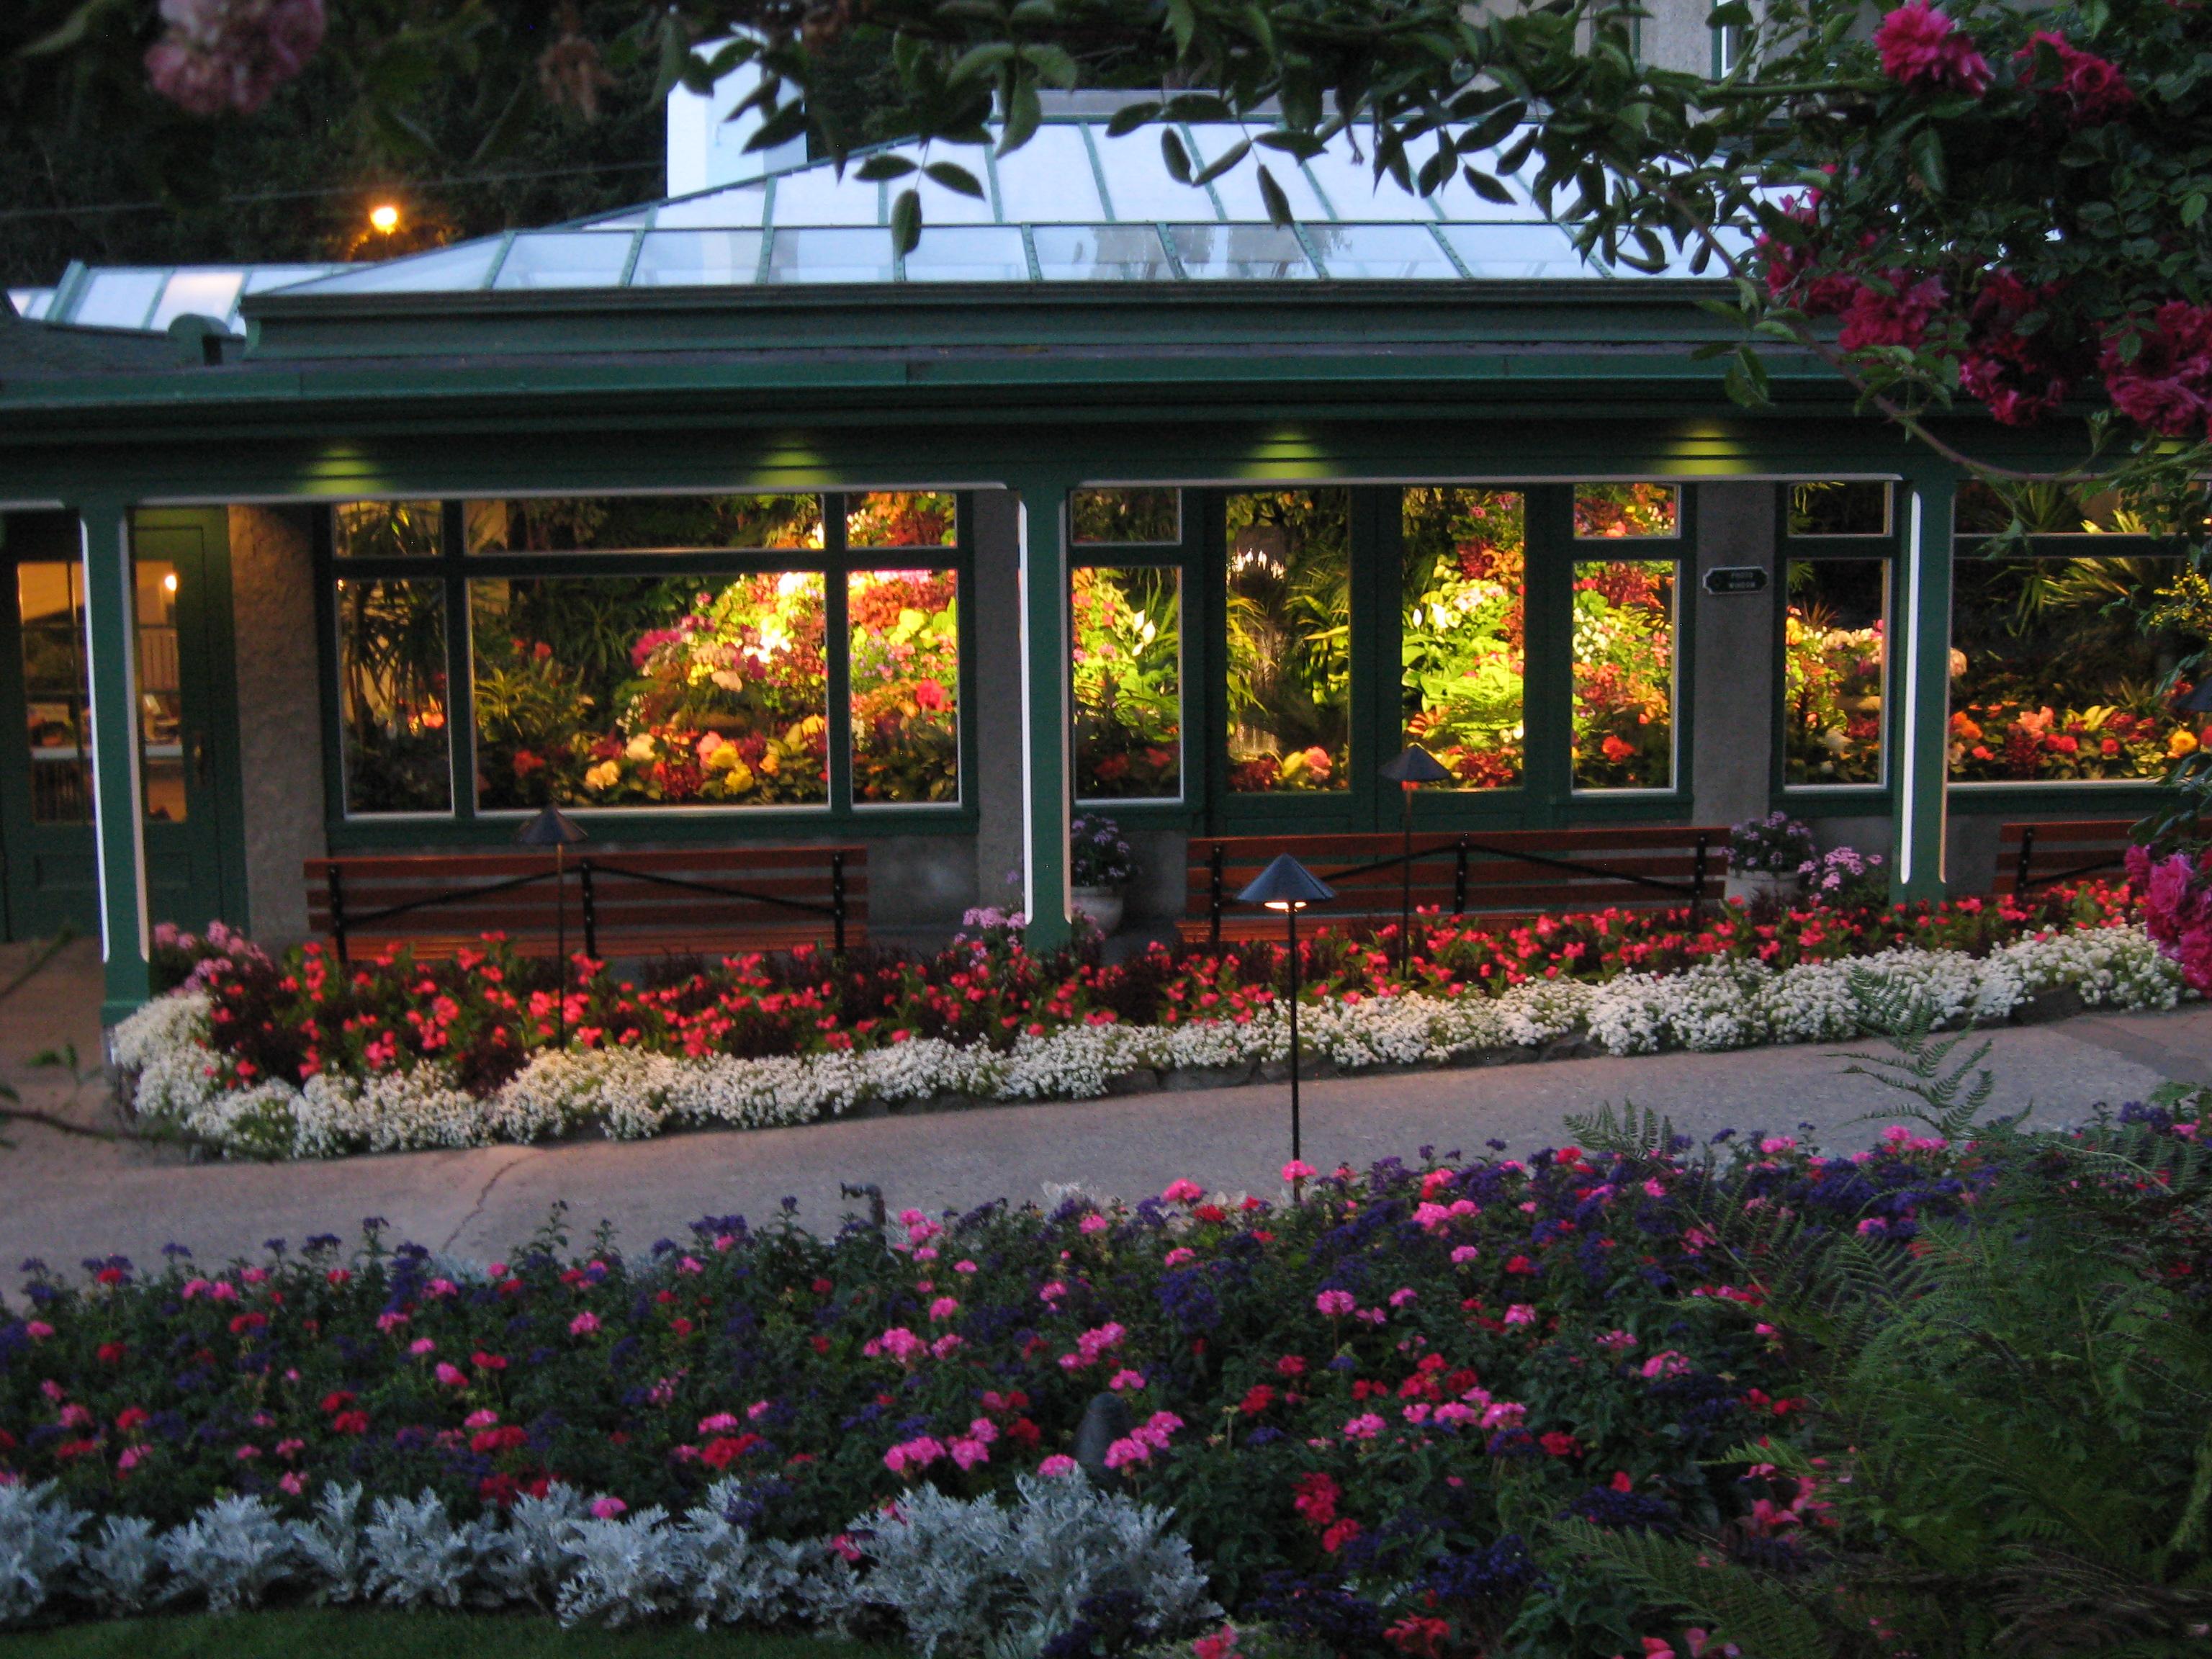 Flower Conservatory at Butchart Gardens